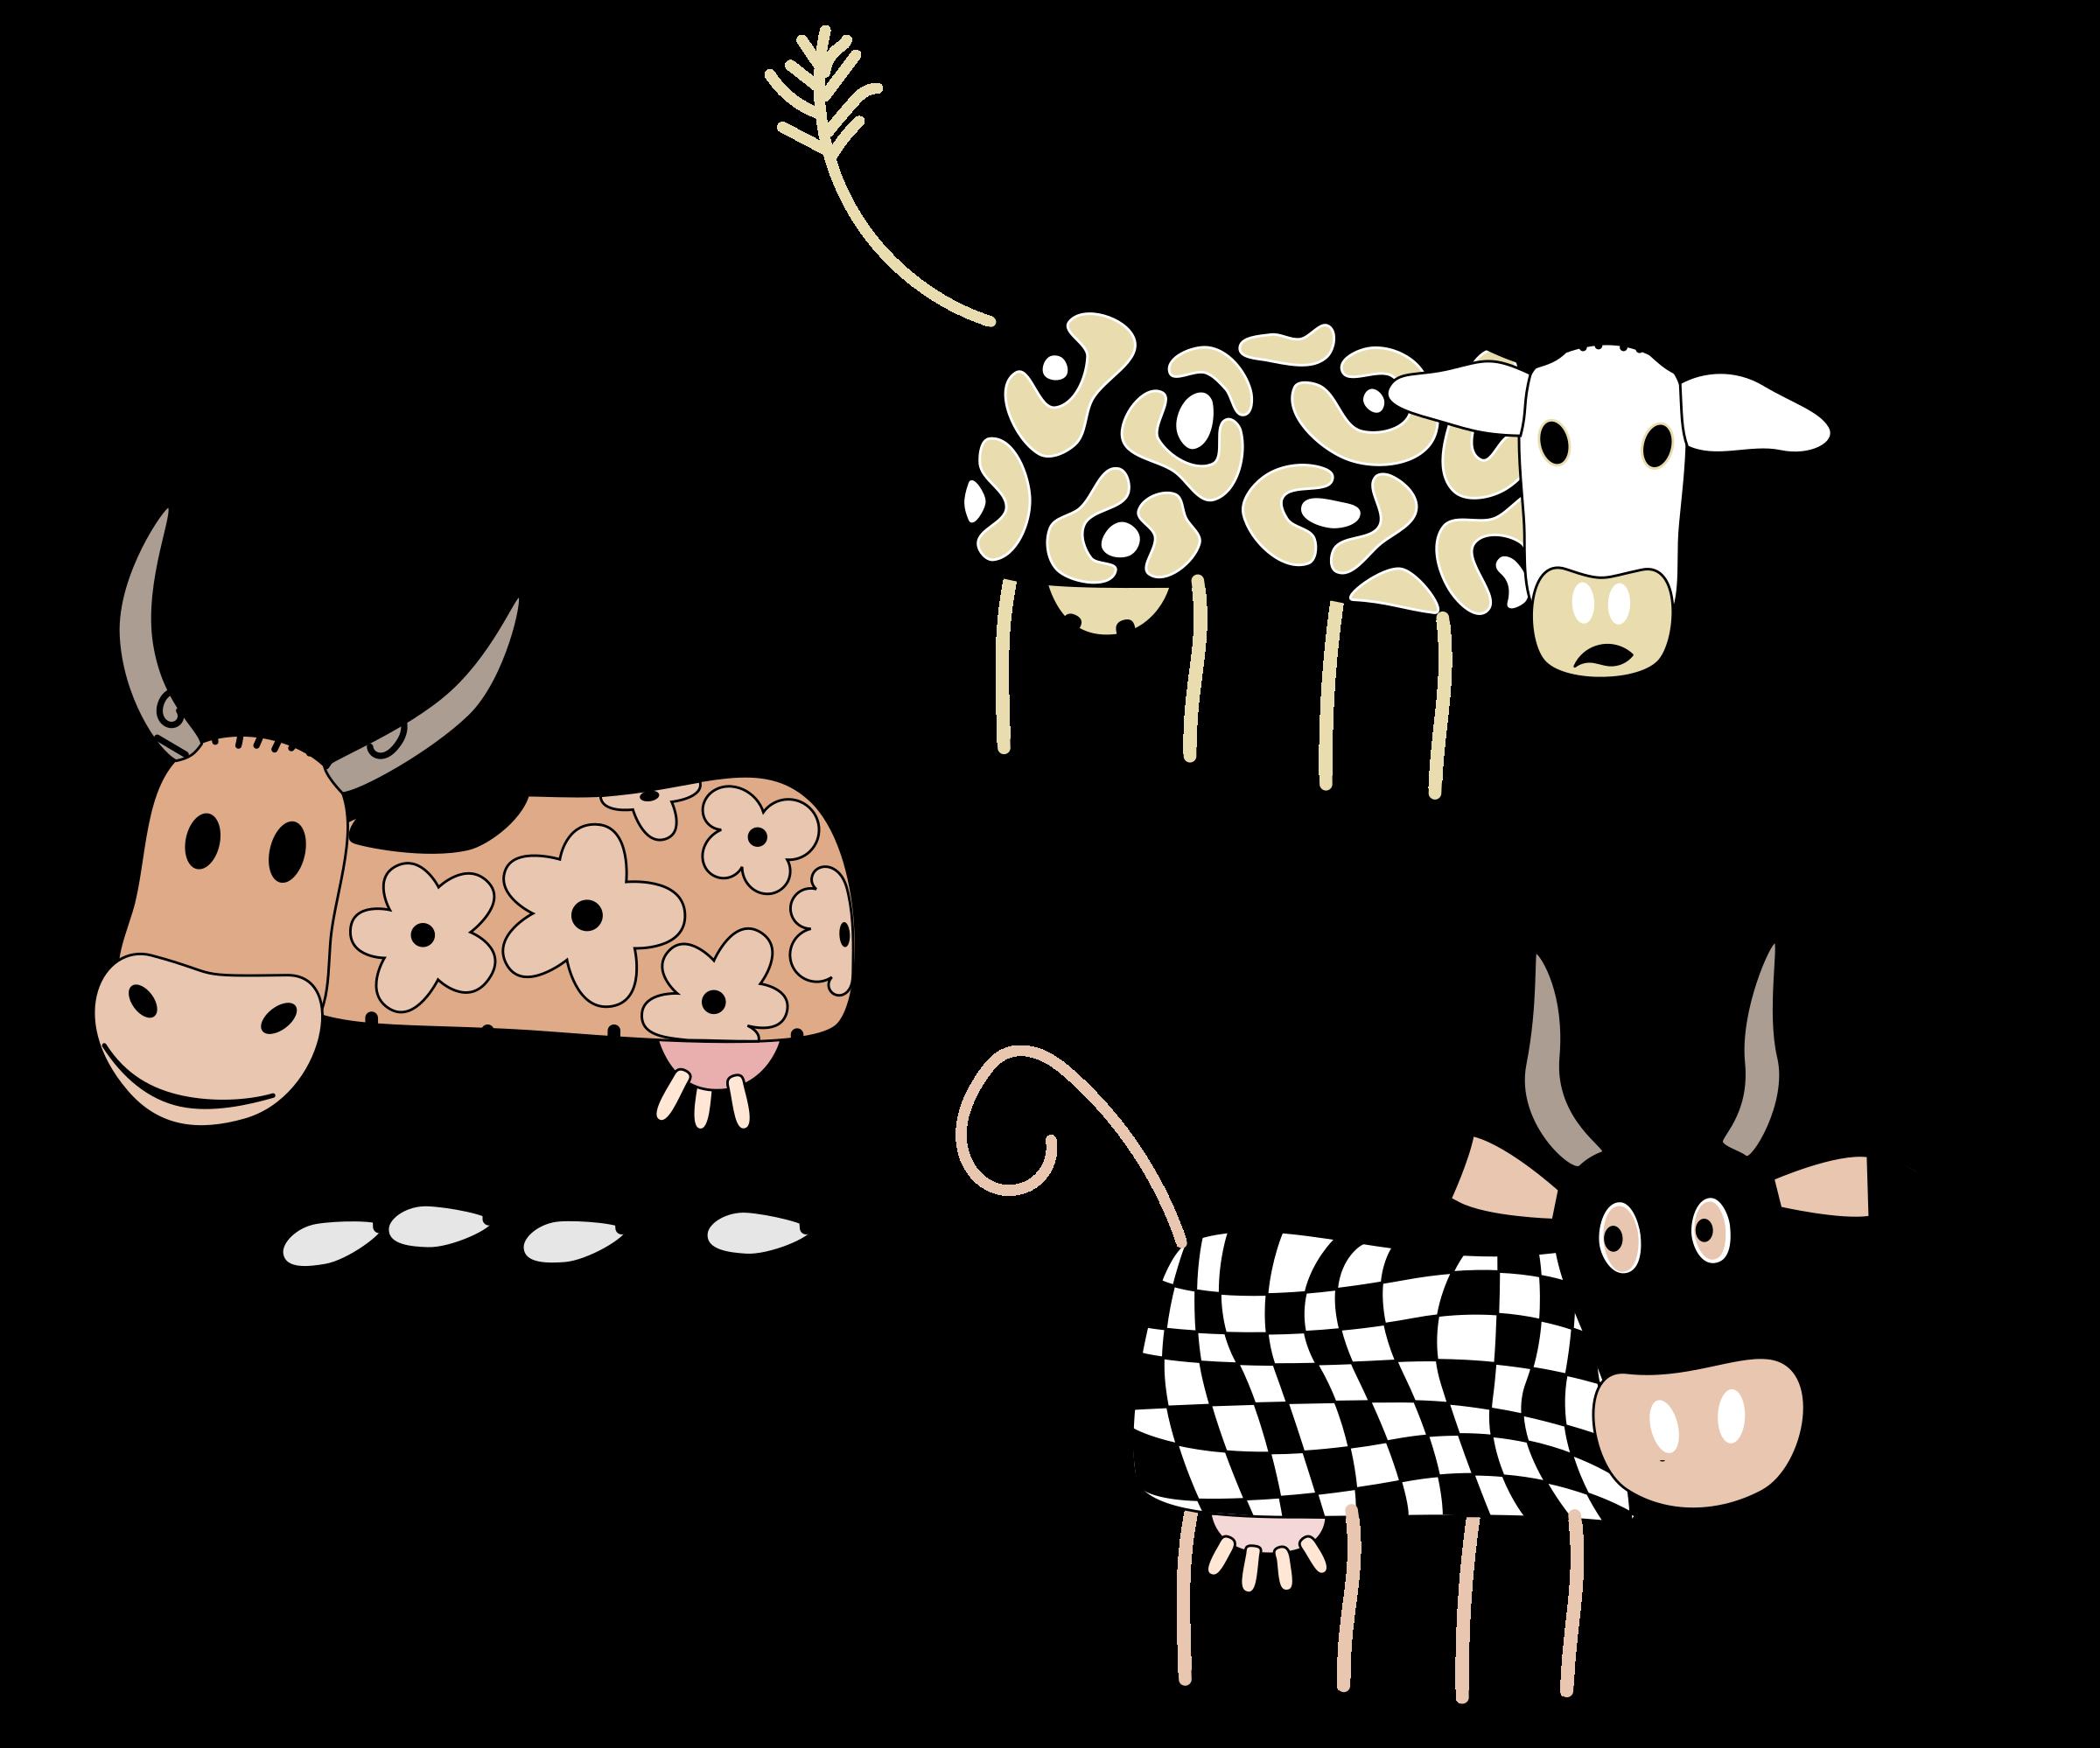 Xray clipart cartoon. Cows big image png